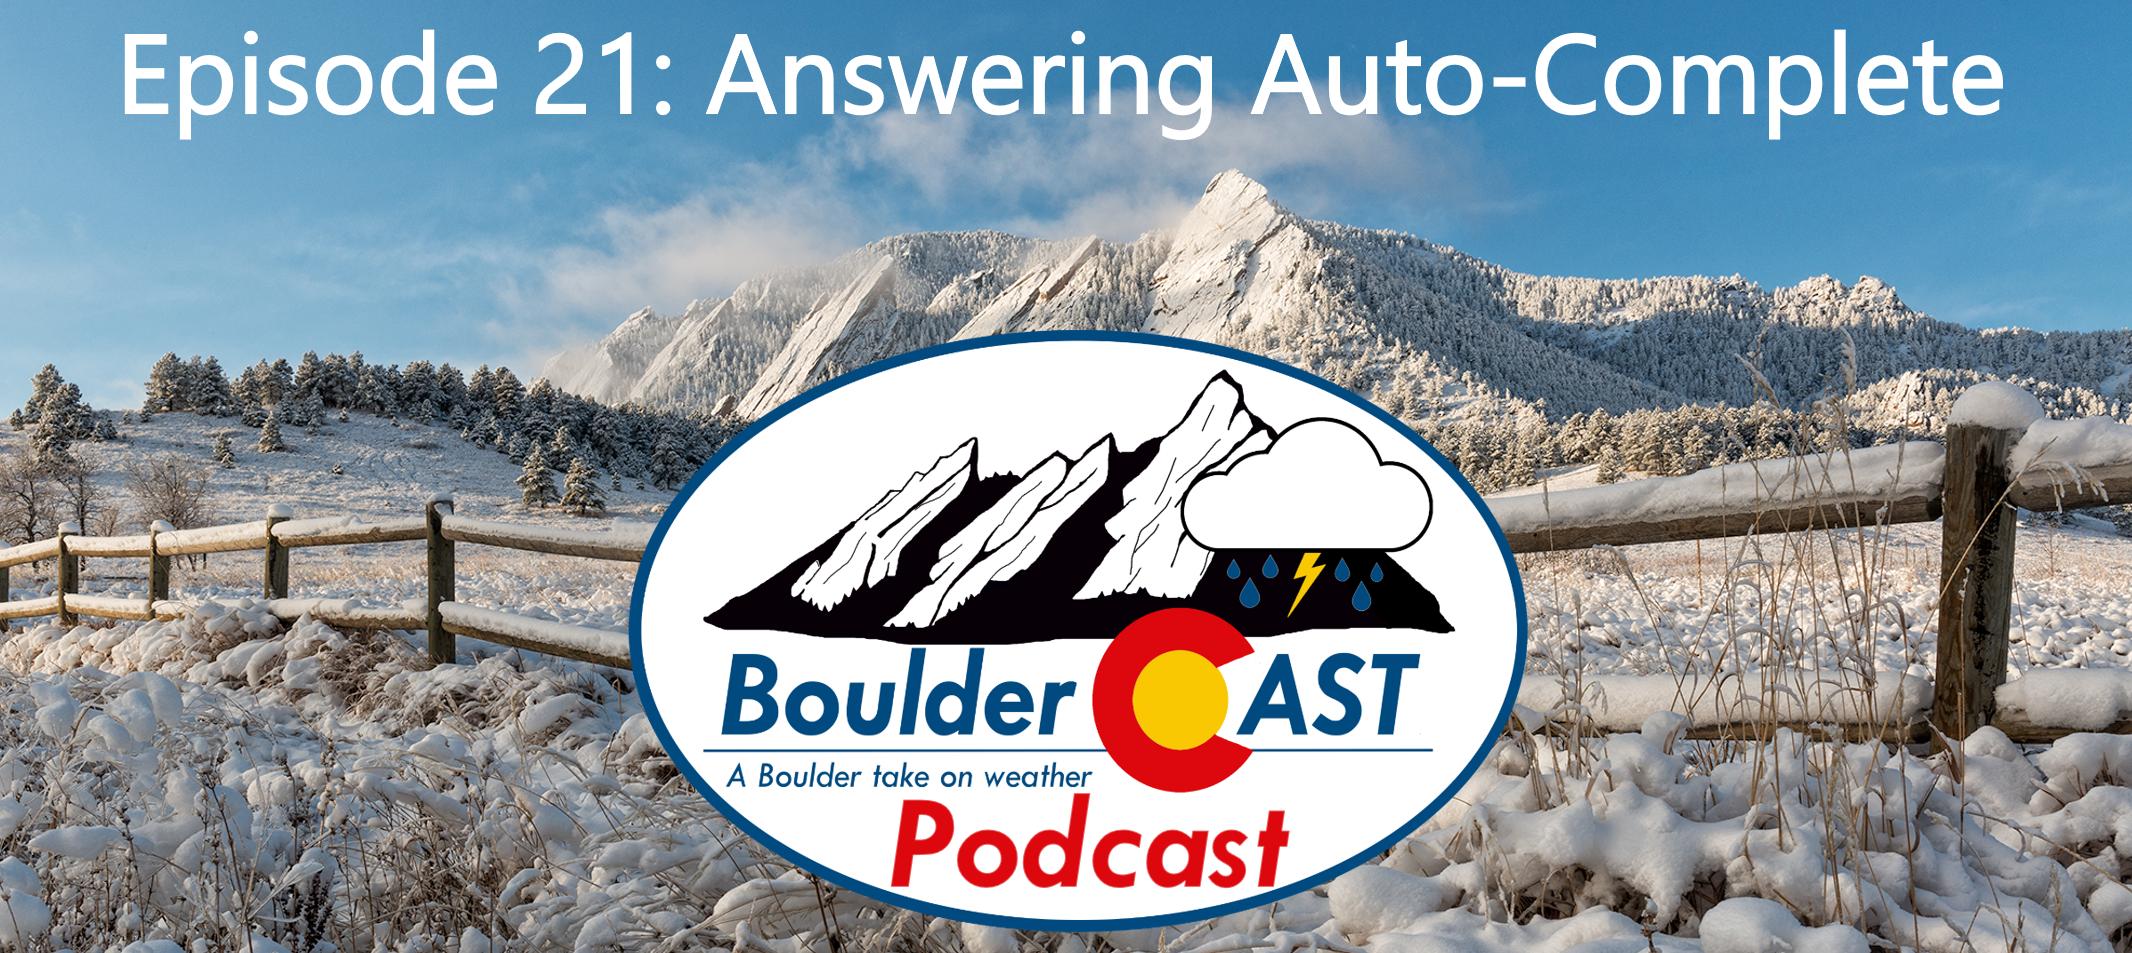 Airbnb Boulder Episode 21 Answering Auto Complete Bouldercast